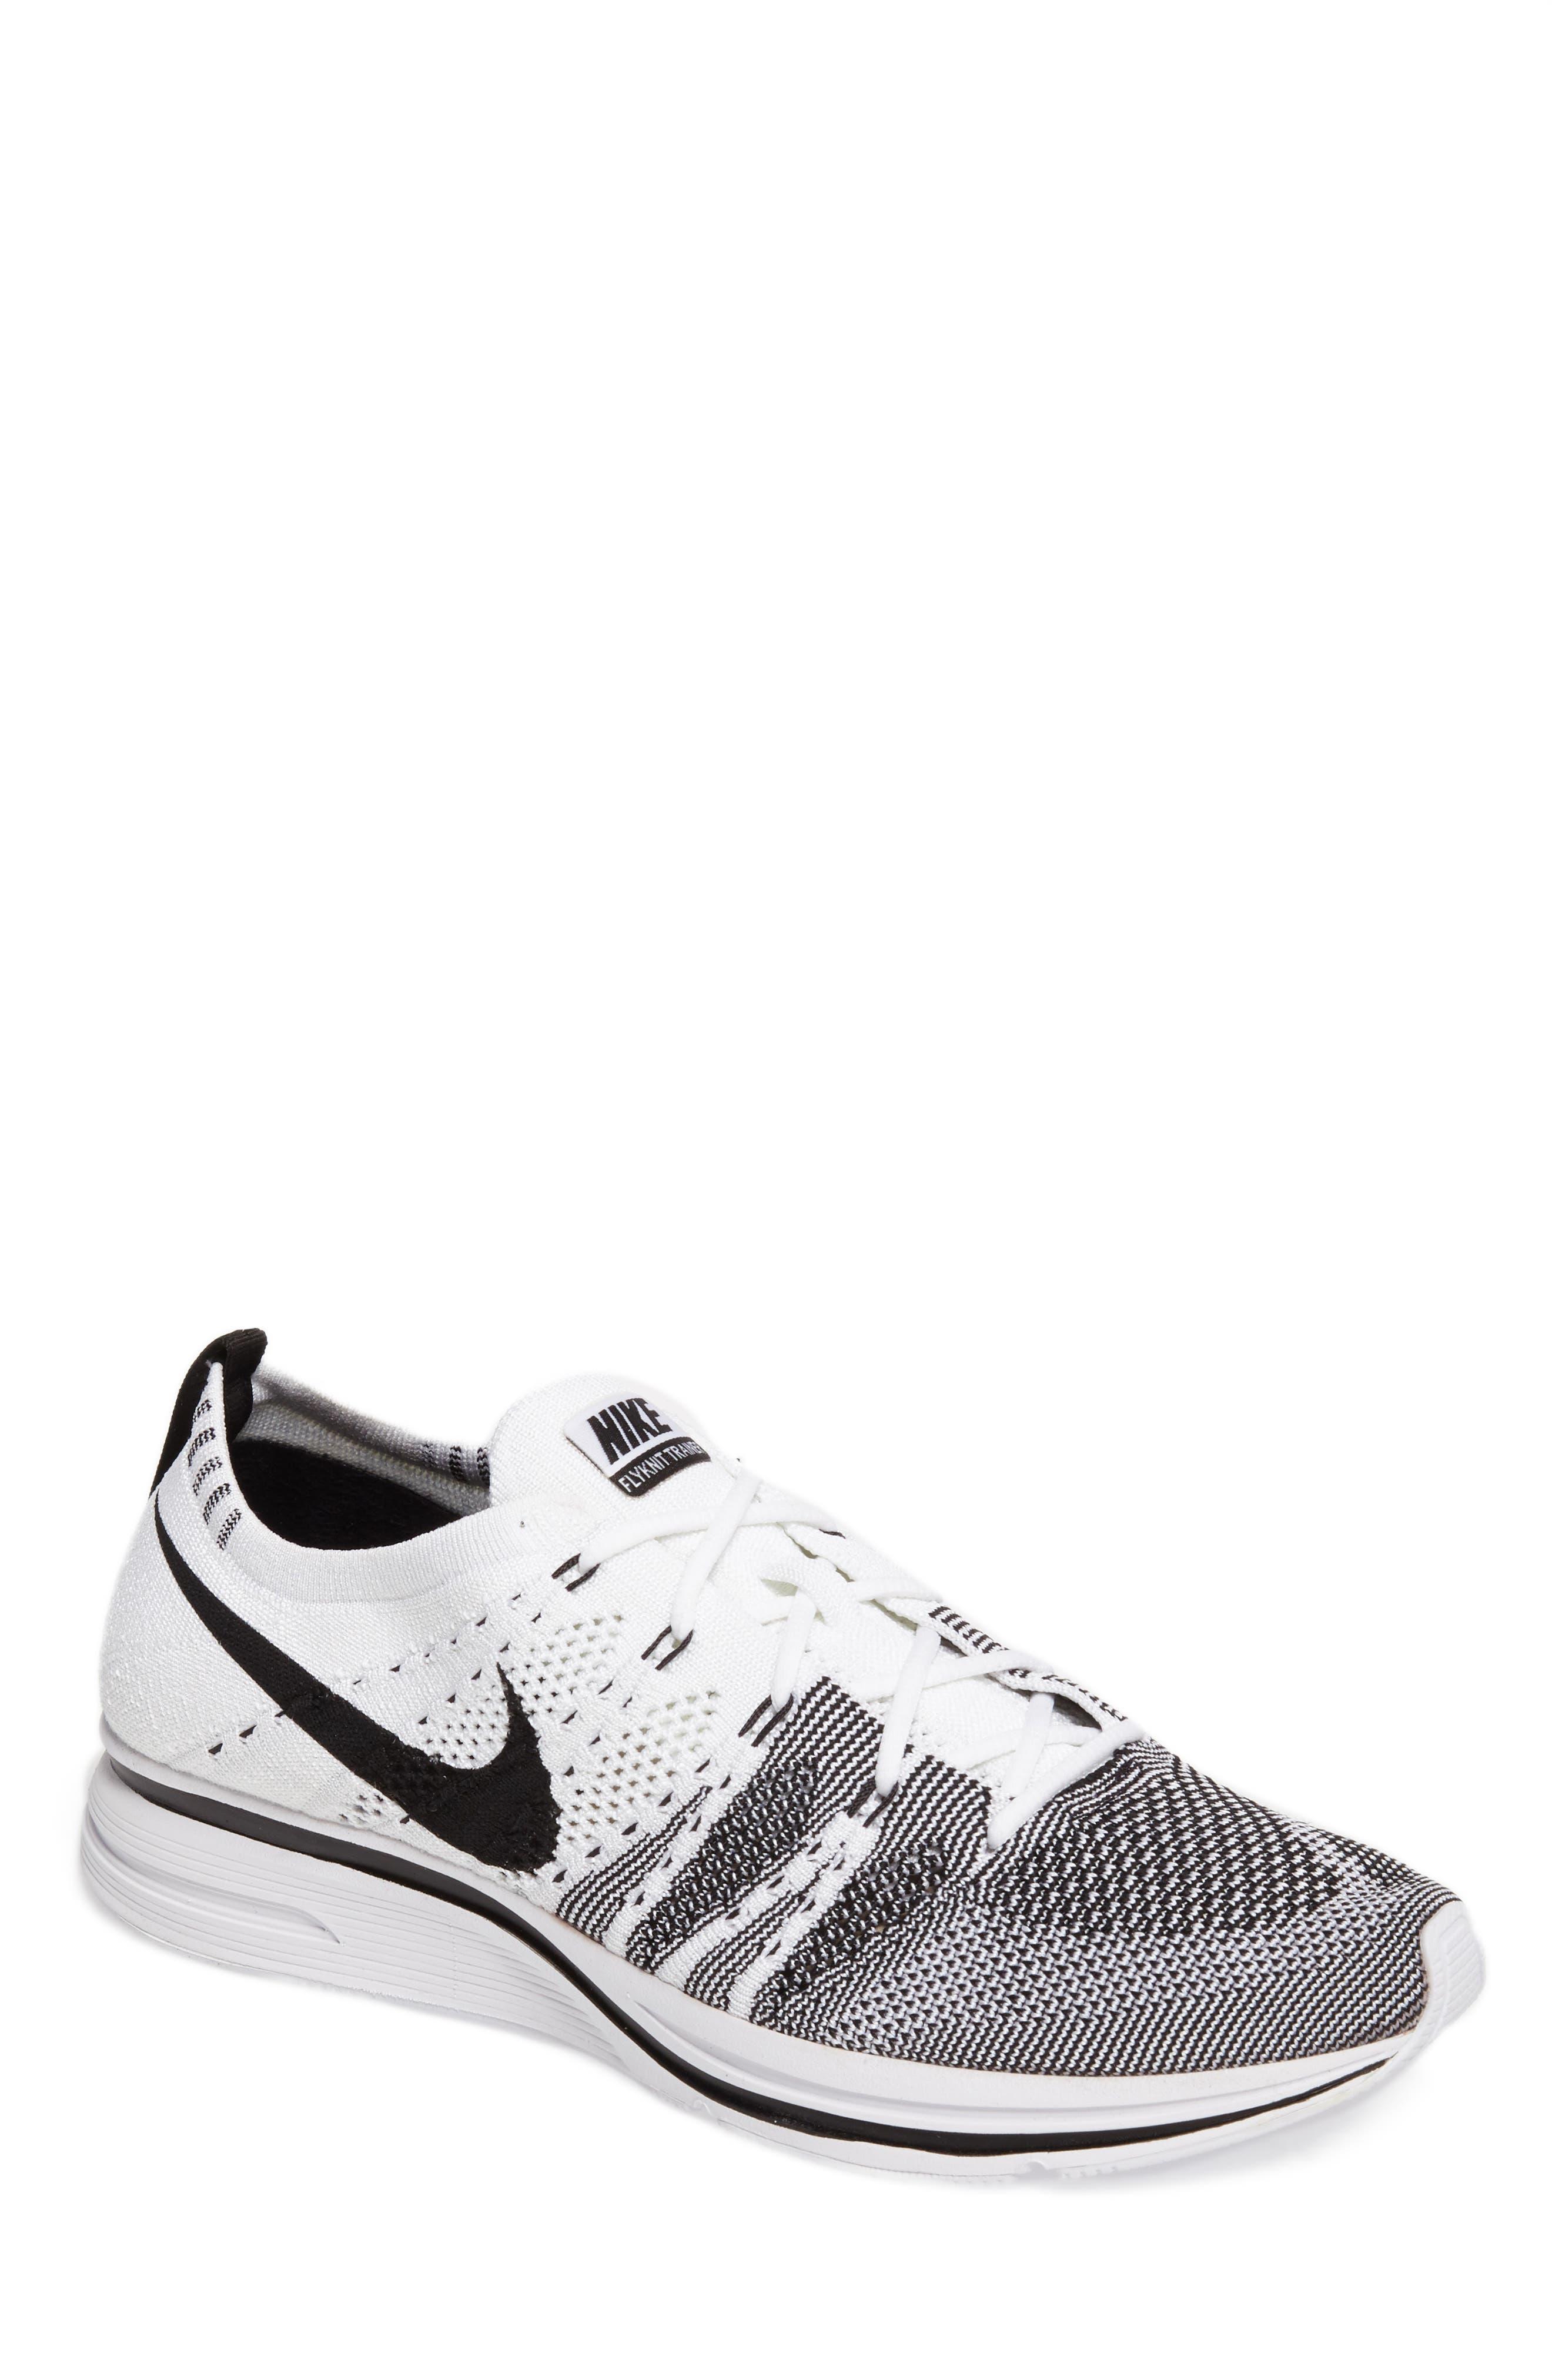 NikeLab Flyknit Trainer Sneaker,                         Main,                         color, 100